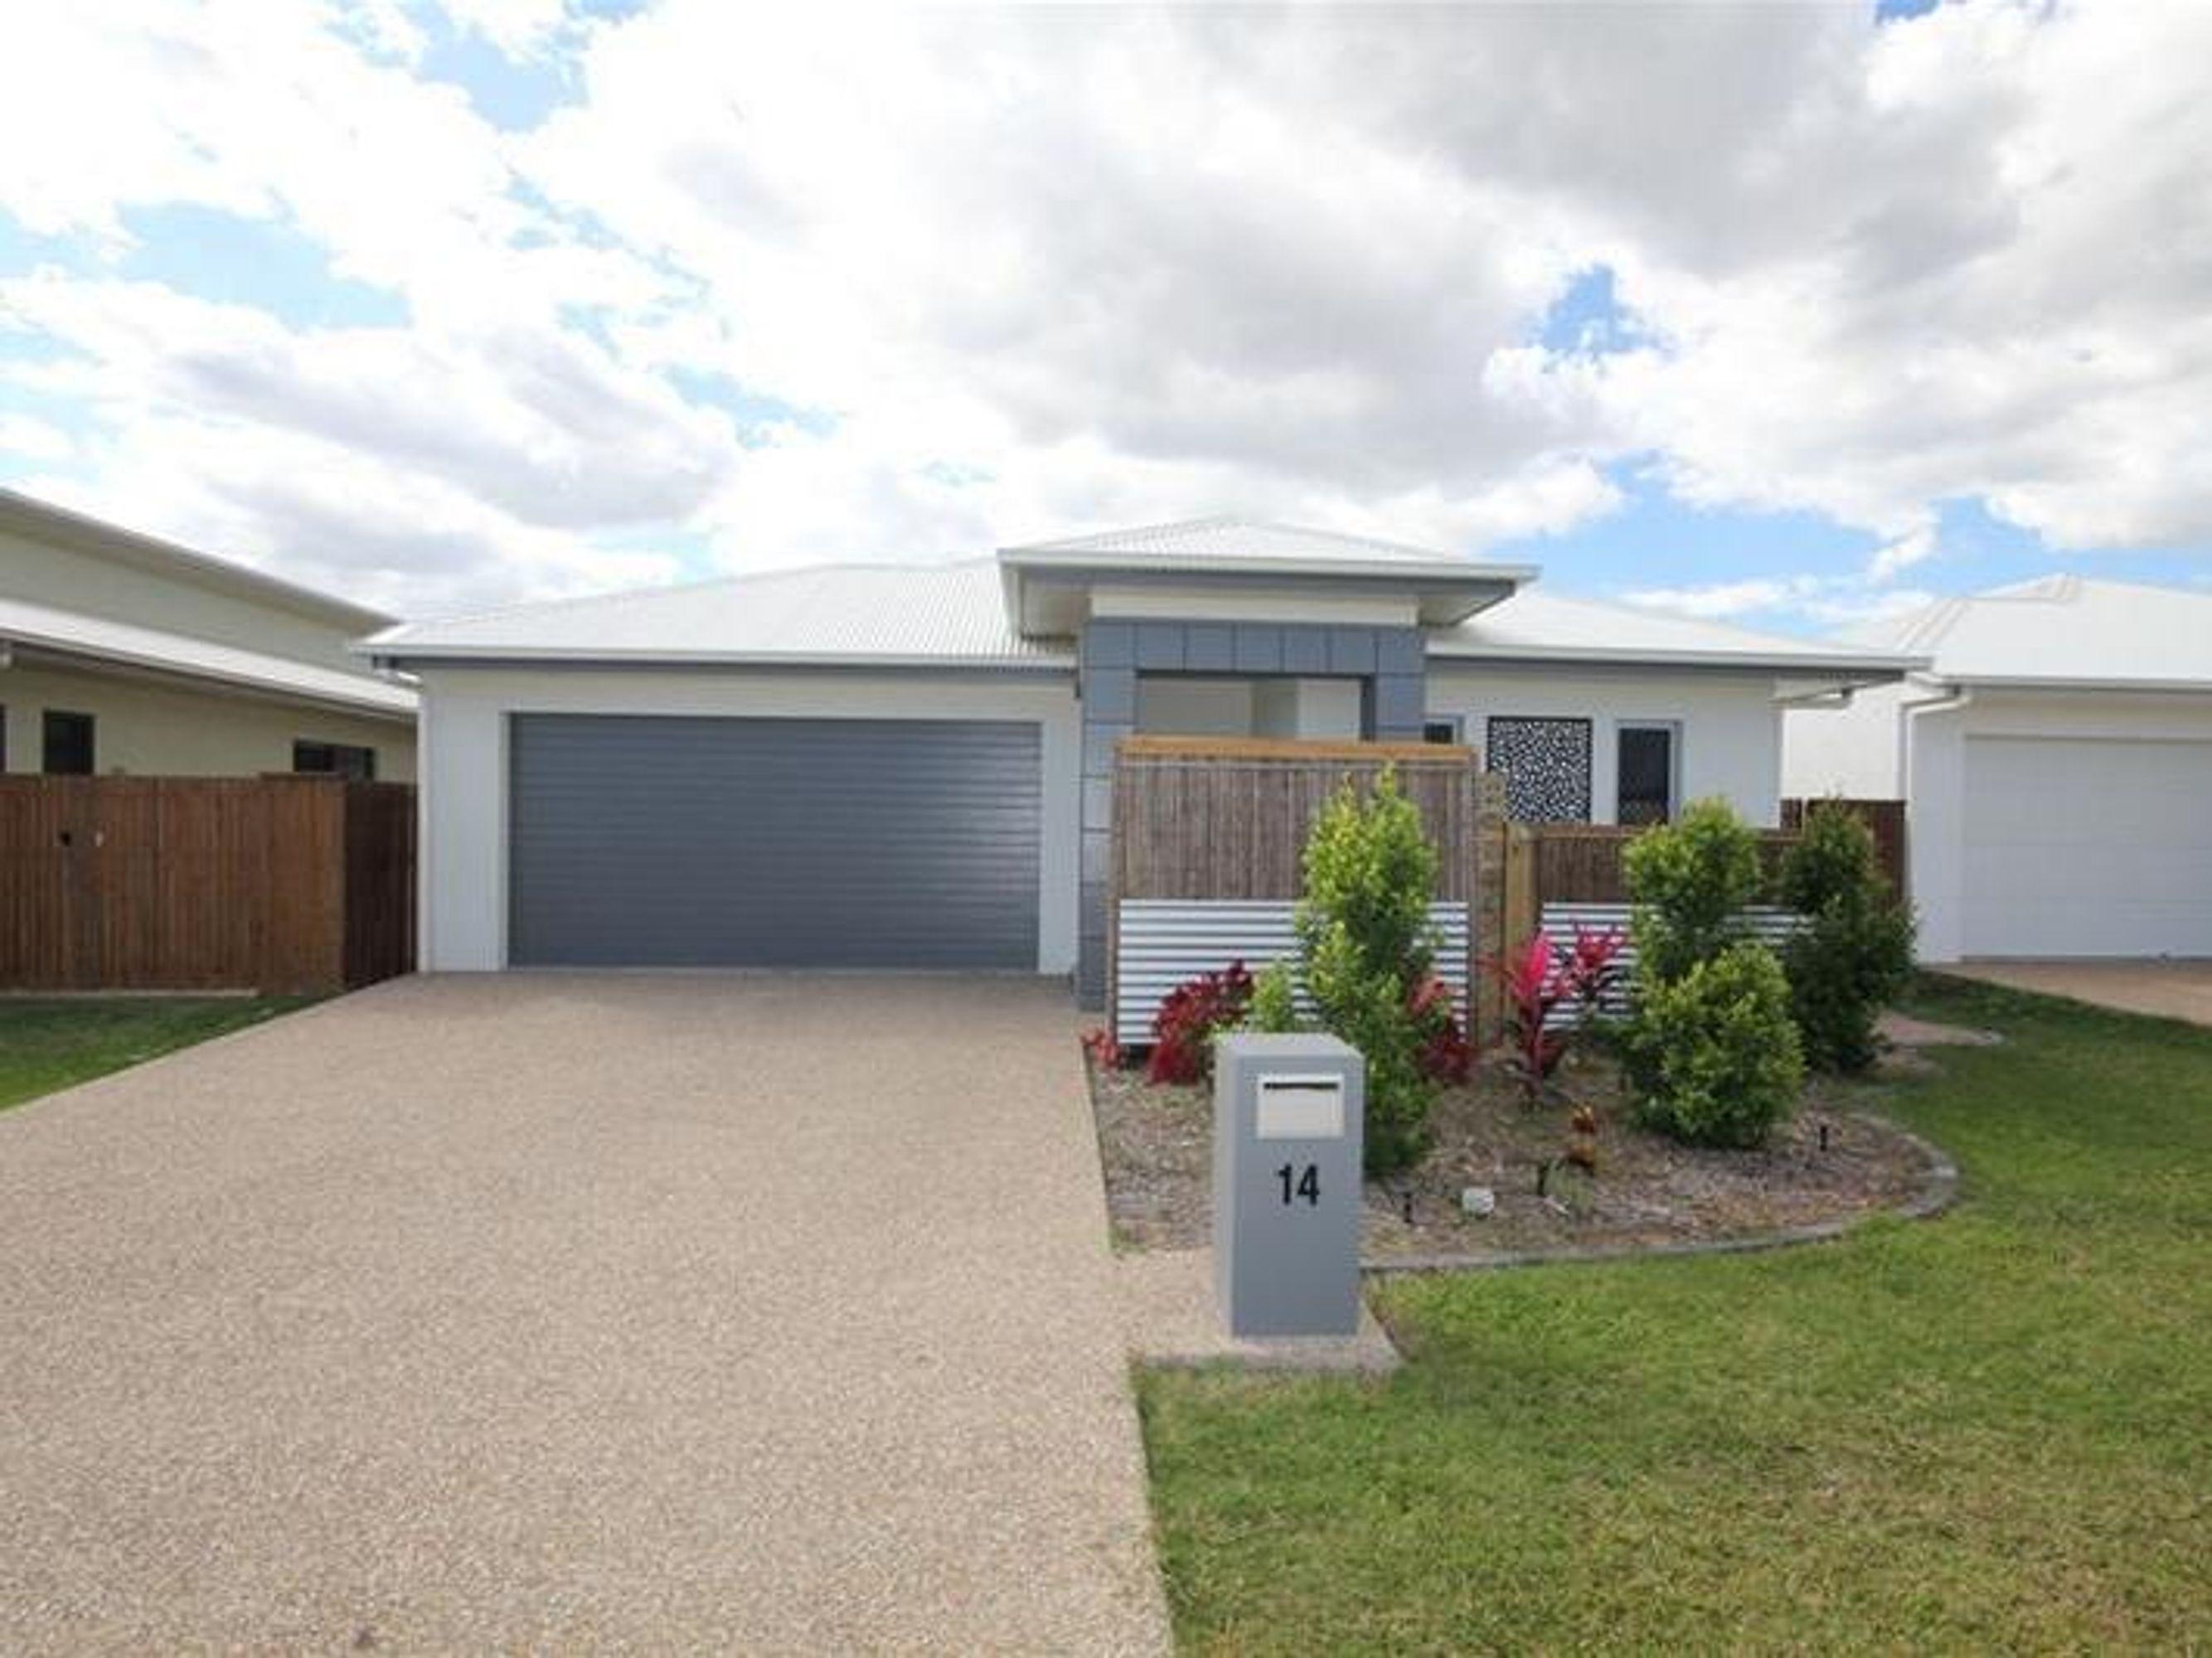 14 Diversity Street, Rasmussen, QLD 4815